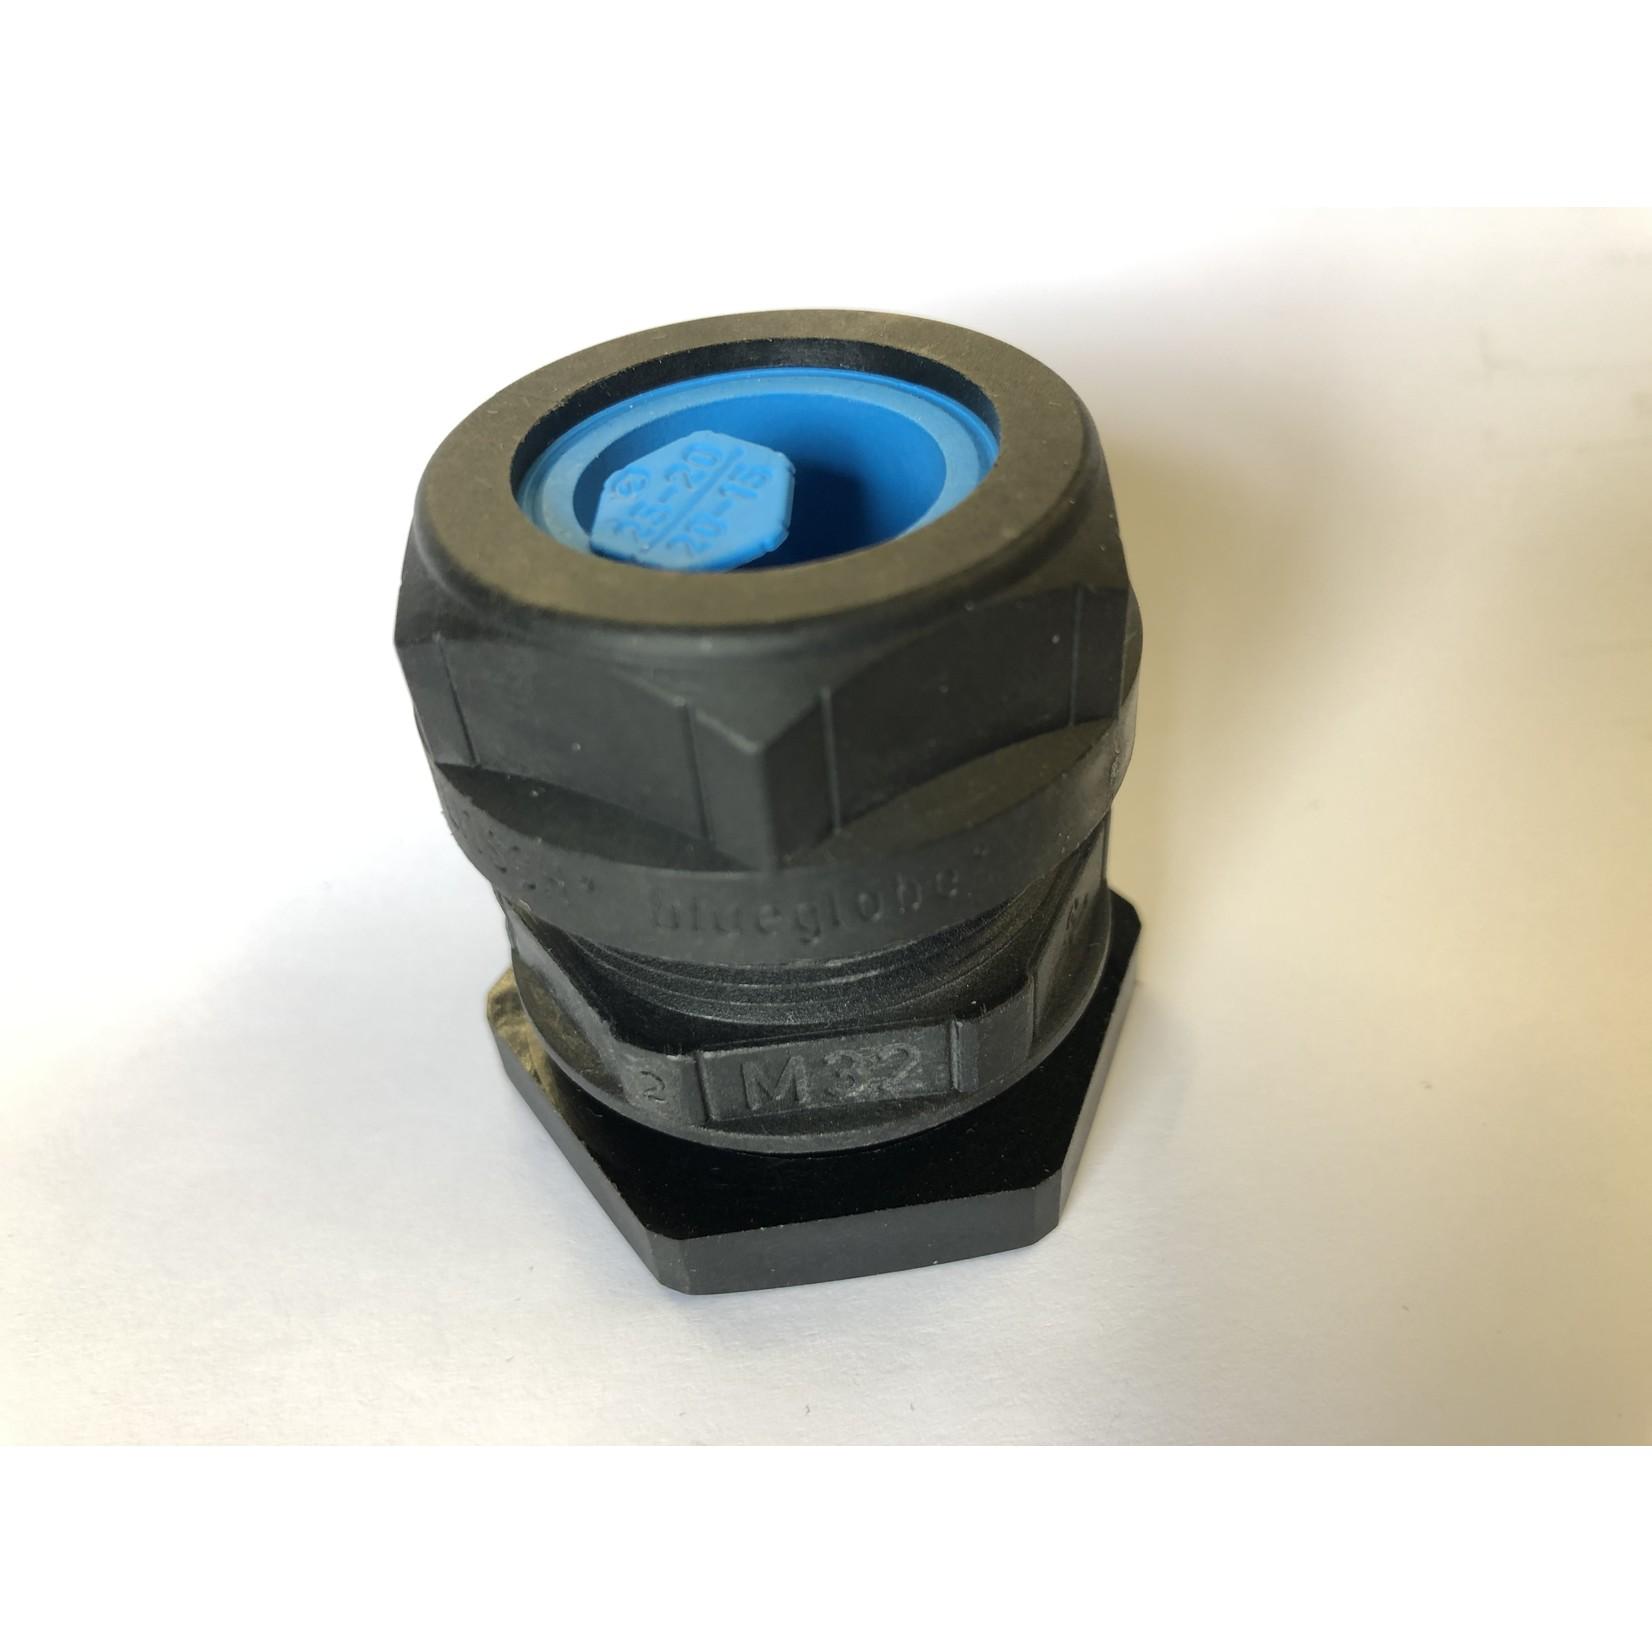 Robesol Sensor wartel M-32